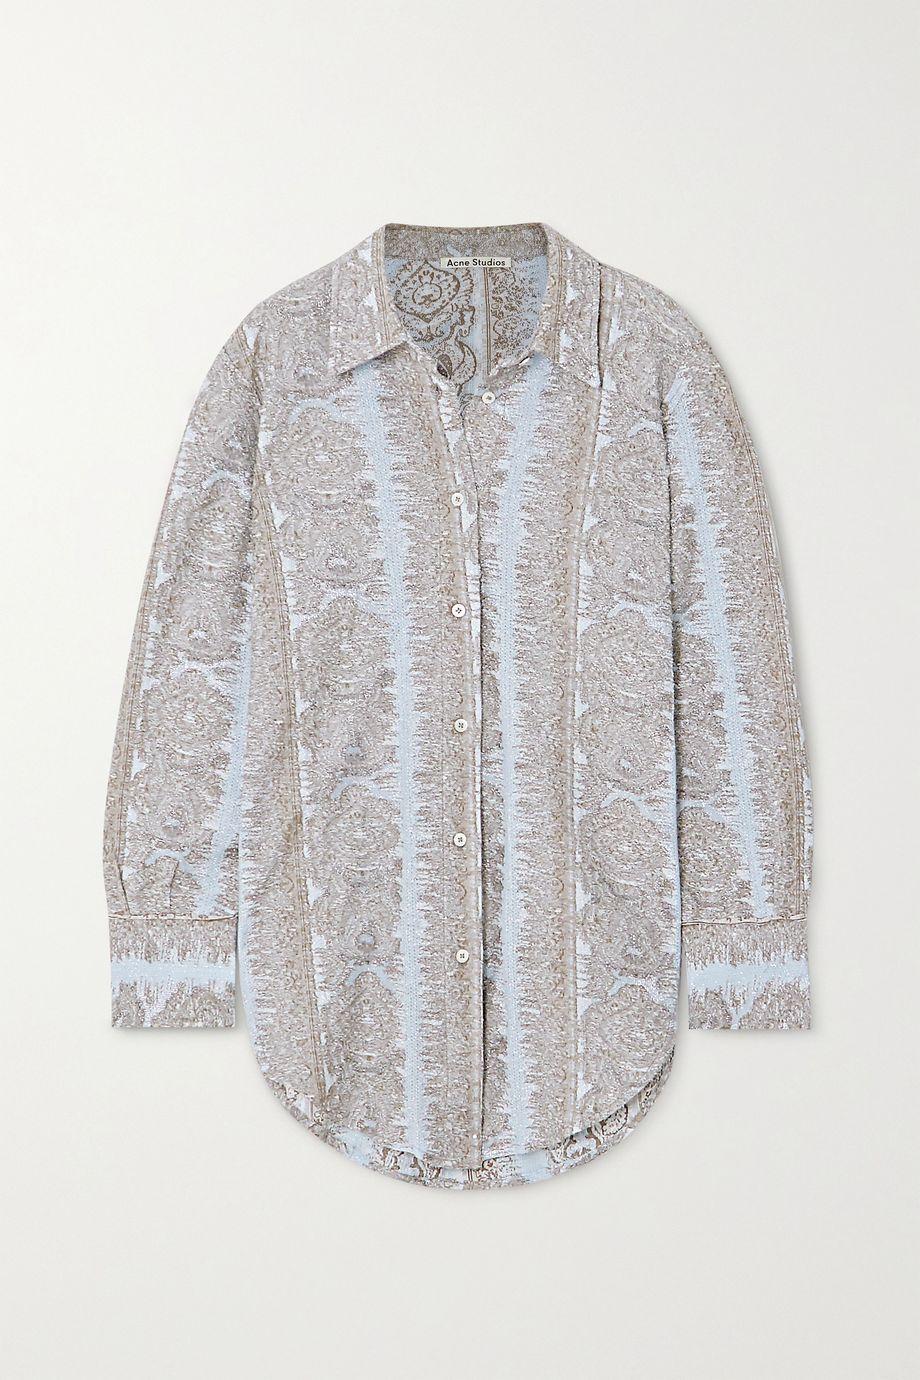 Acne Studios Metallic cotton-blend jacquard shirt